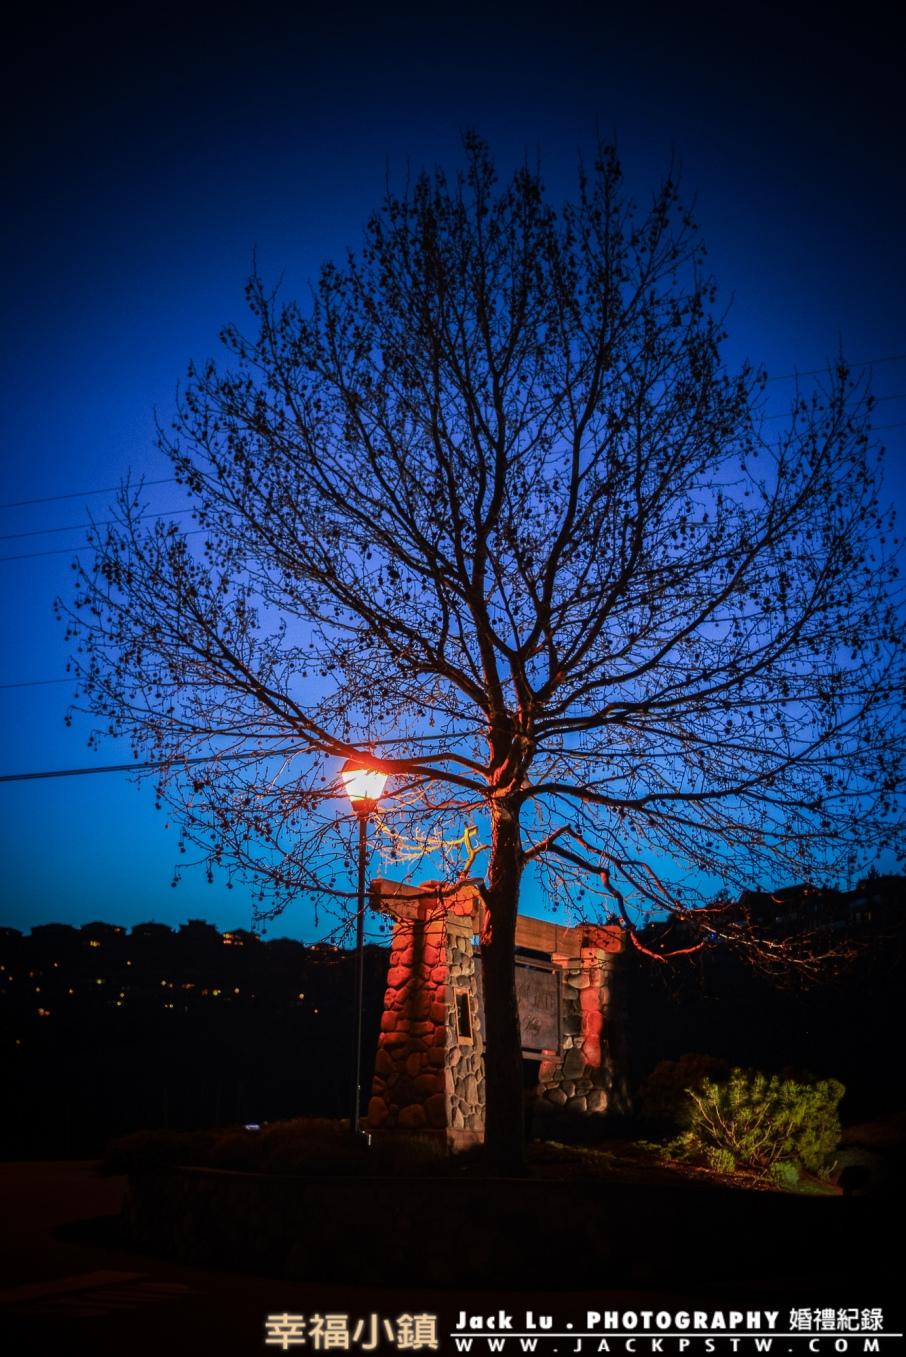 Bc-kalowna-photo-winery-46